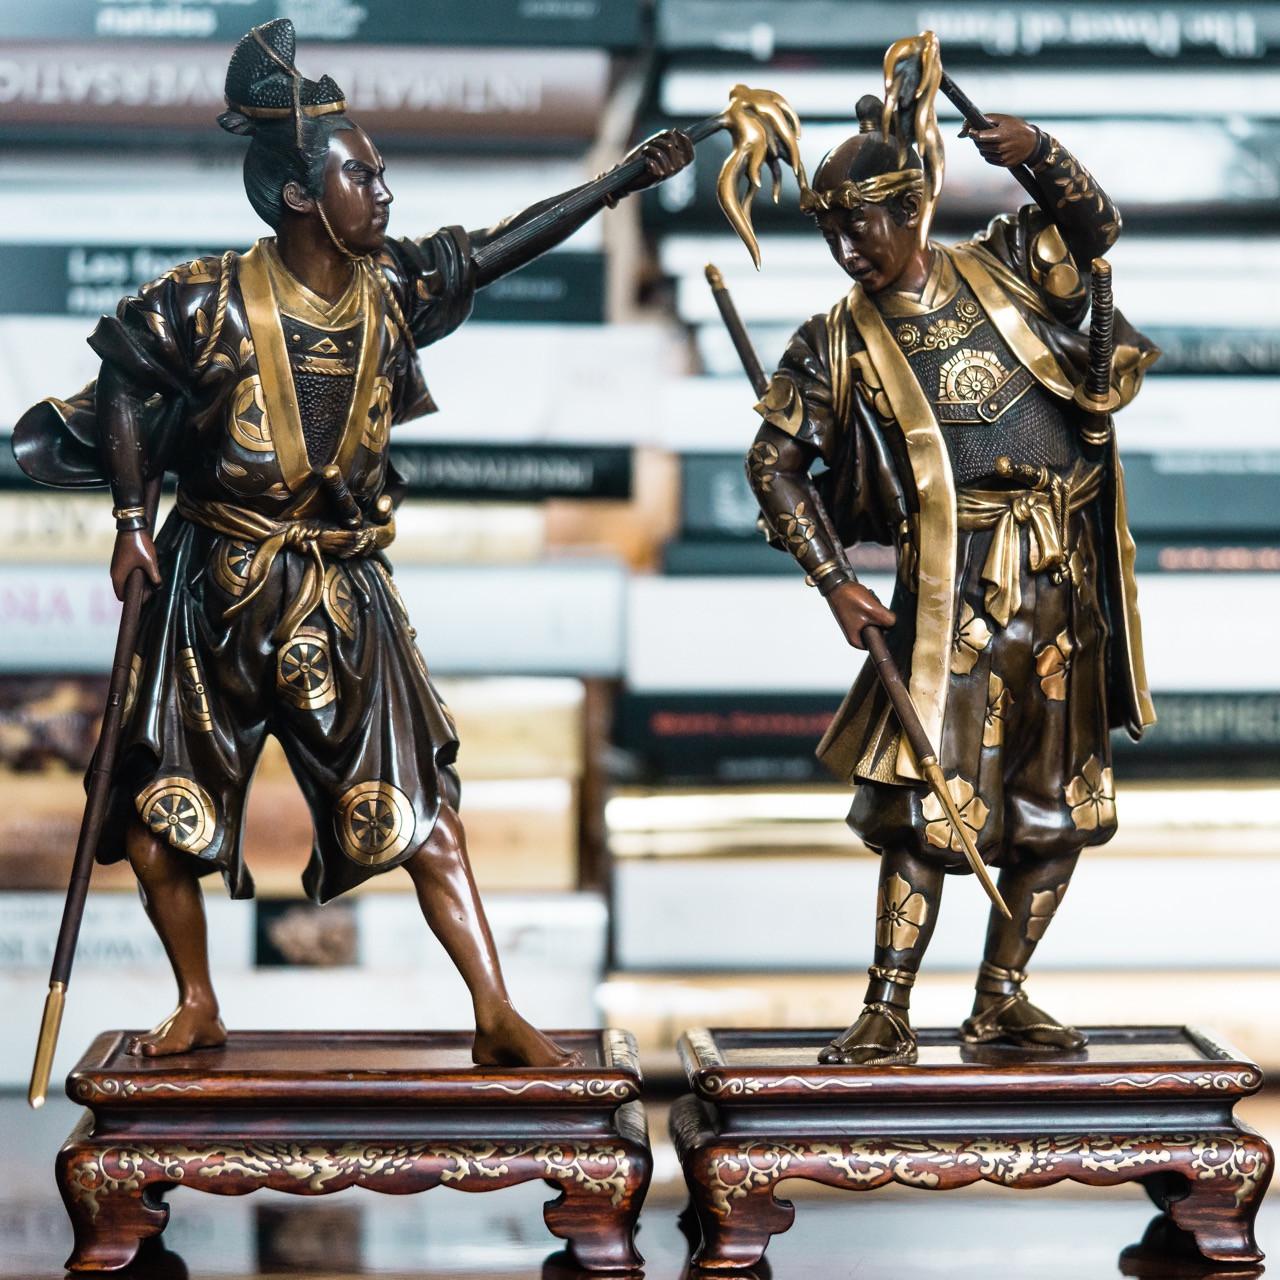 [AsianArt]BronzeNightGuards-08604.jpg